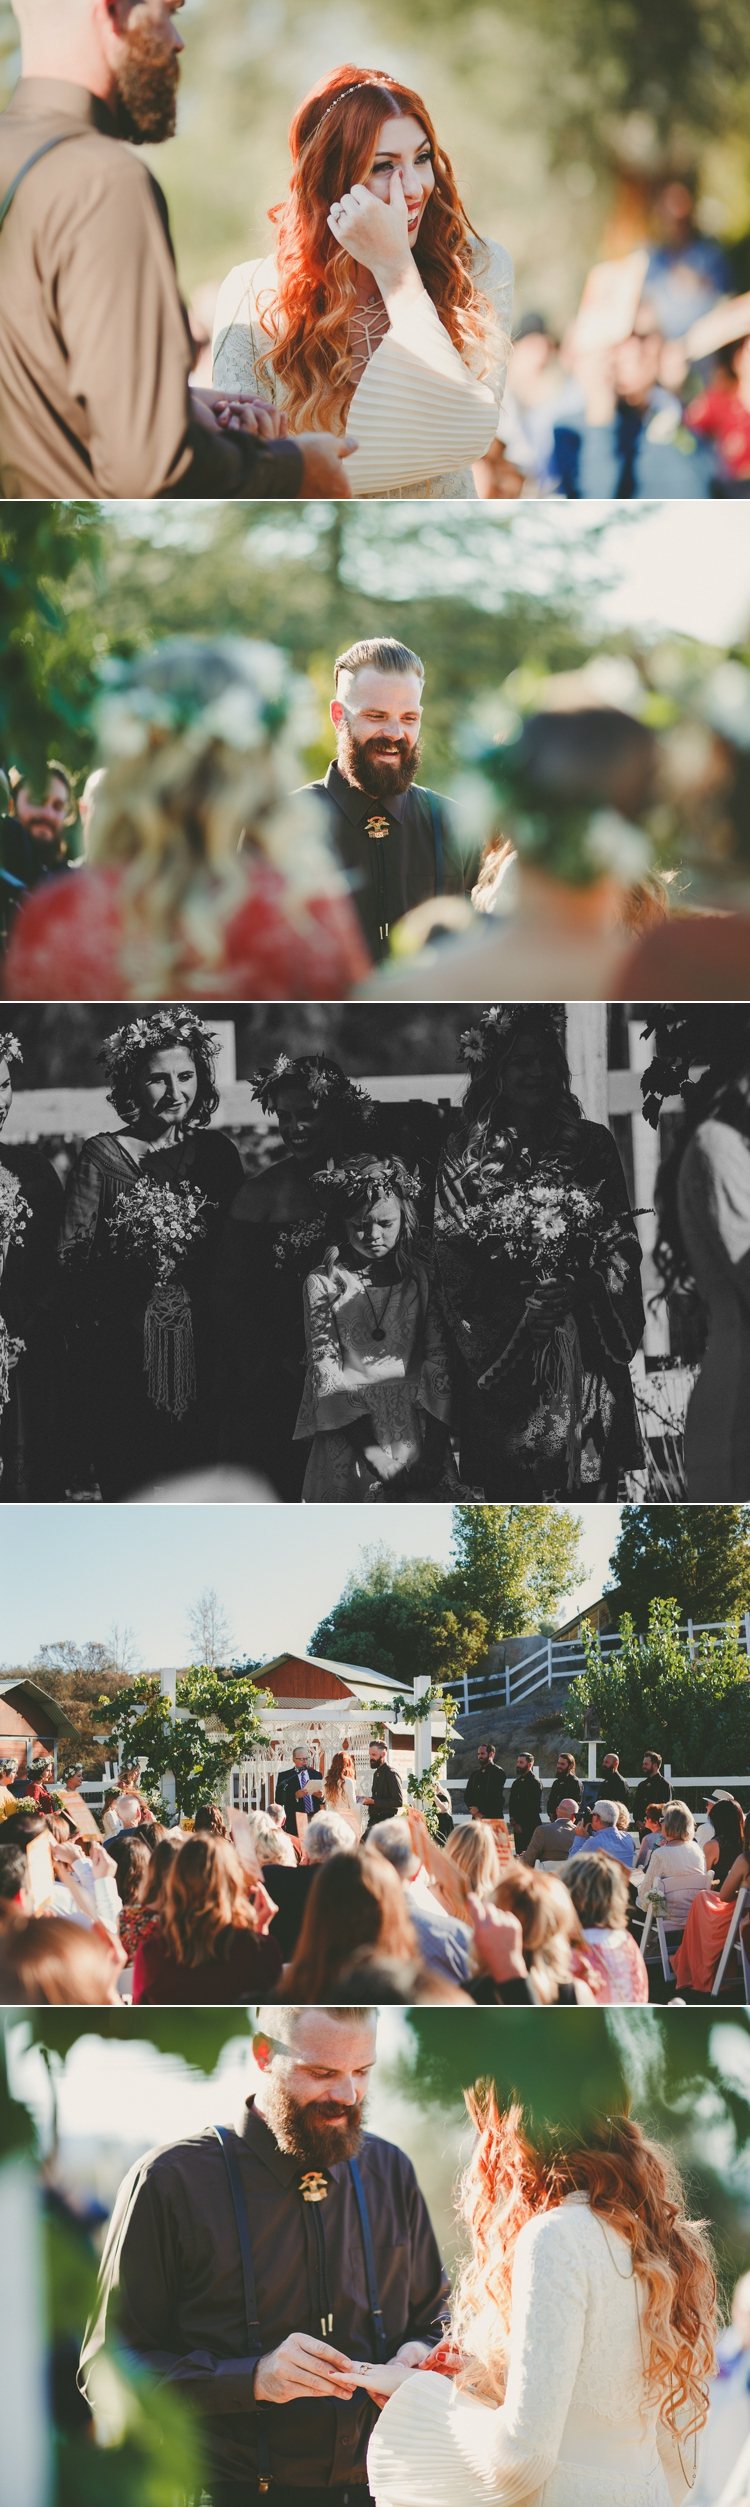 woodstock-inspired-wedding-photos-14